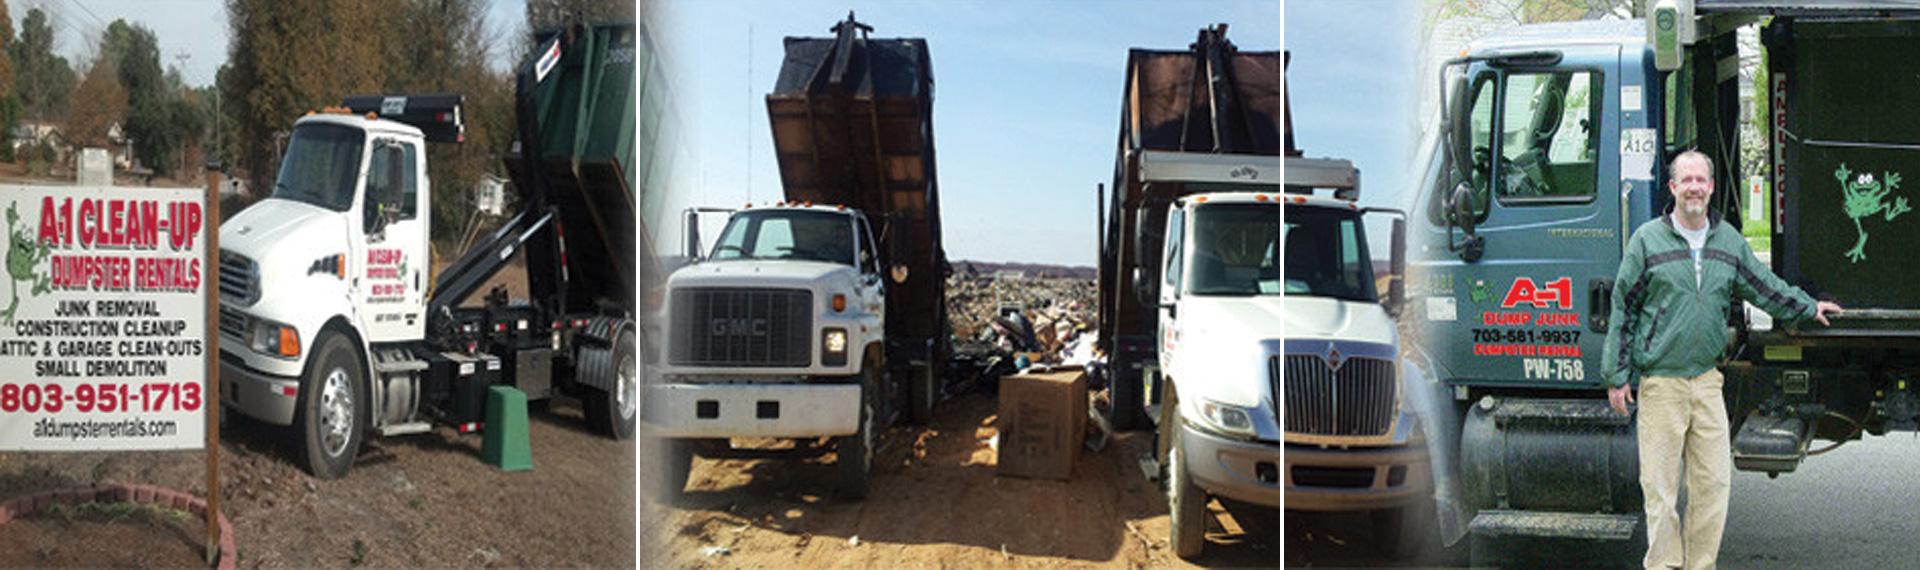 A1 Dumpster Rentals Pelion SC